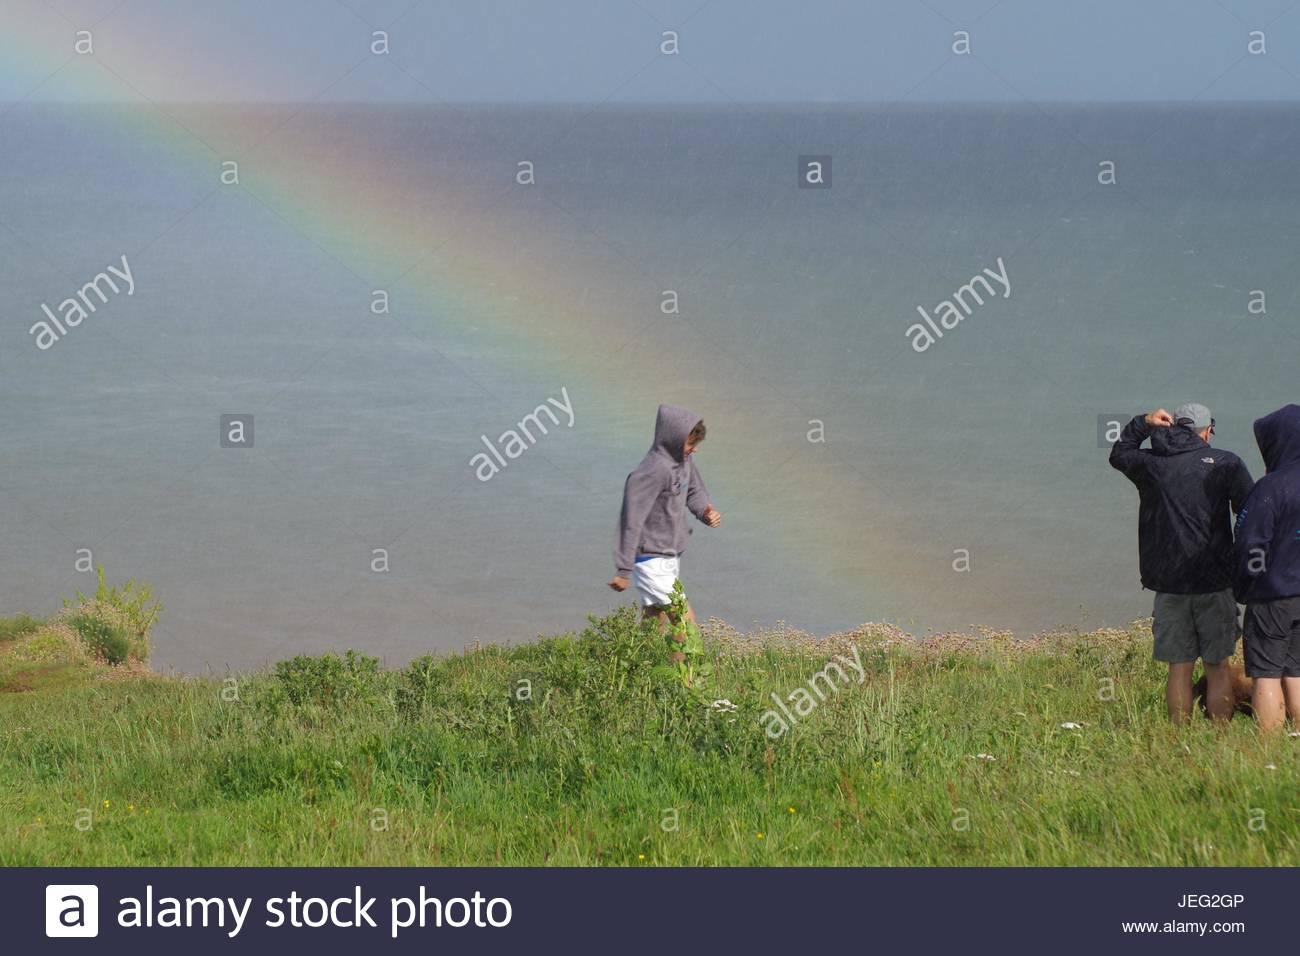 Family Atop Langstone Rock Under a Rainbow on a Rainy Summer Day, Dawlish, Devon, UK. - Stock Image